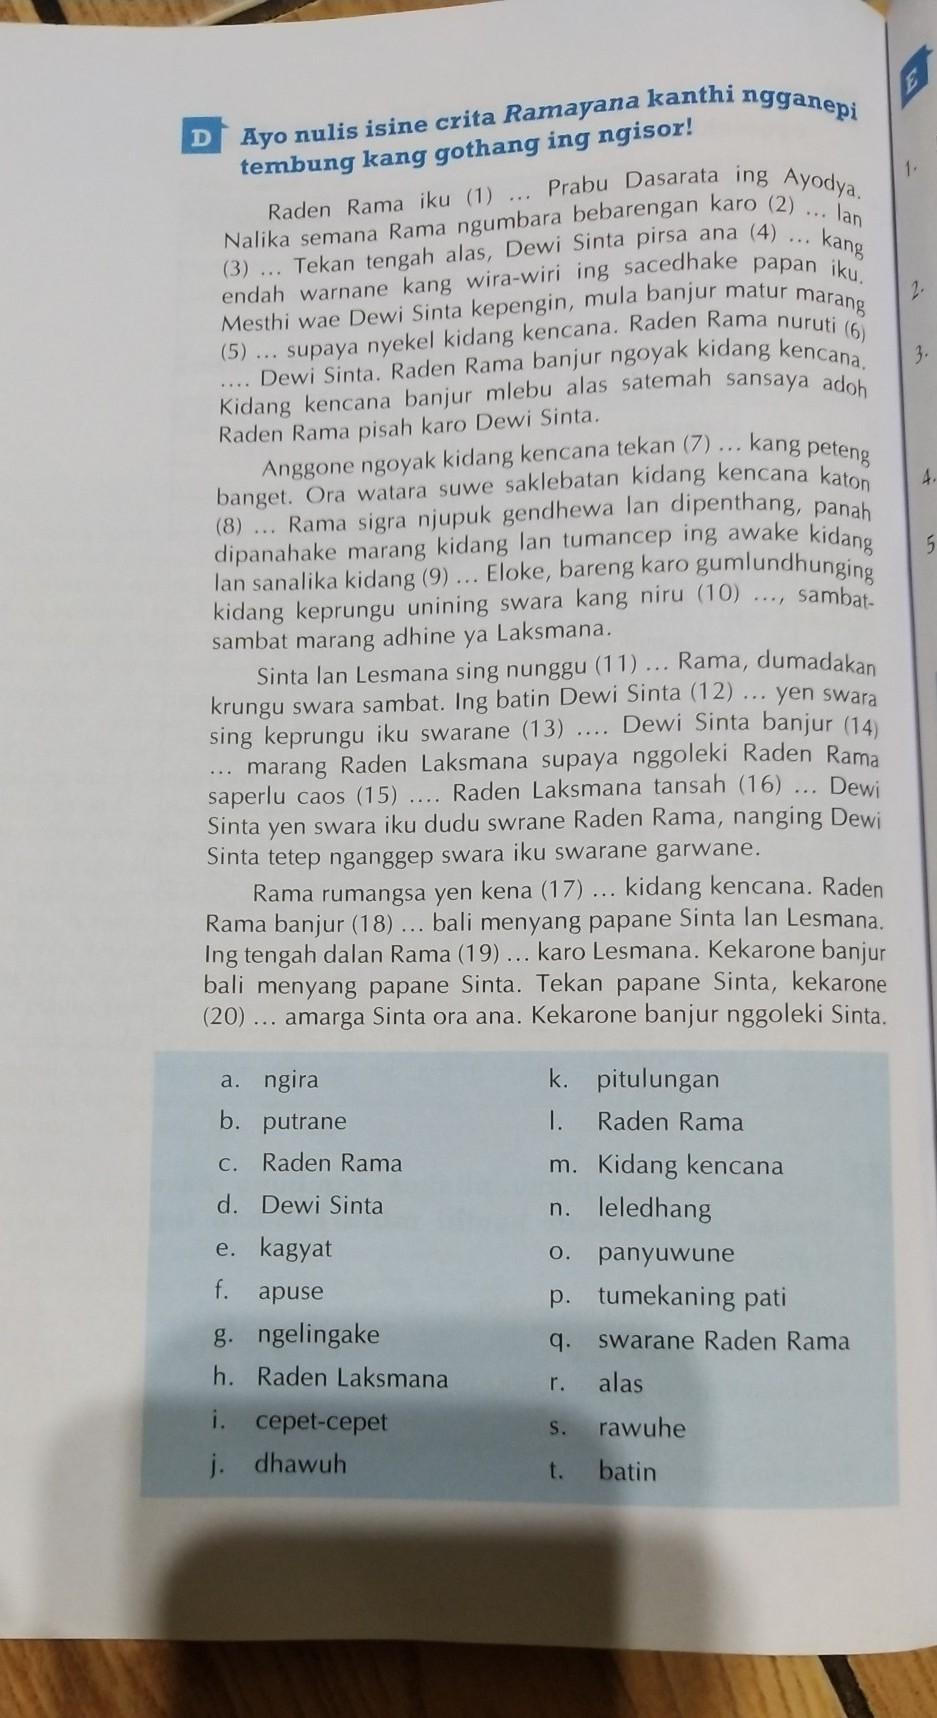 Buku Paket Bahasa Jawa Kelas 5 Kurikulum 2013 - Guru Ilmu ...